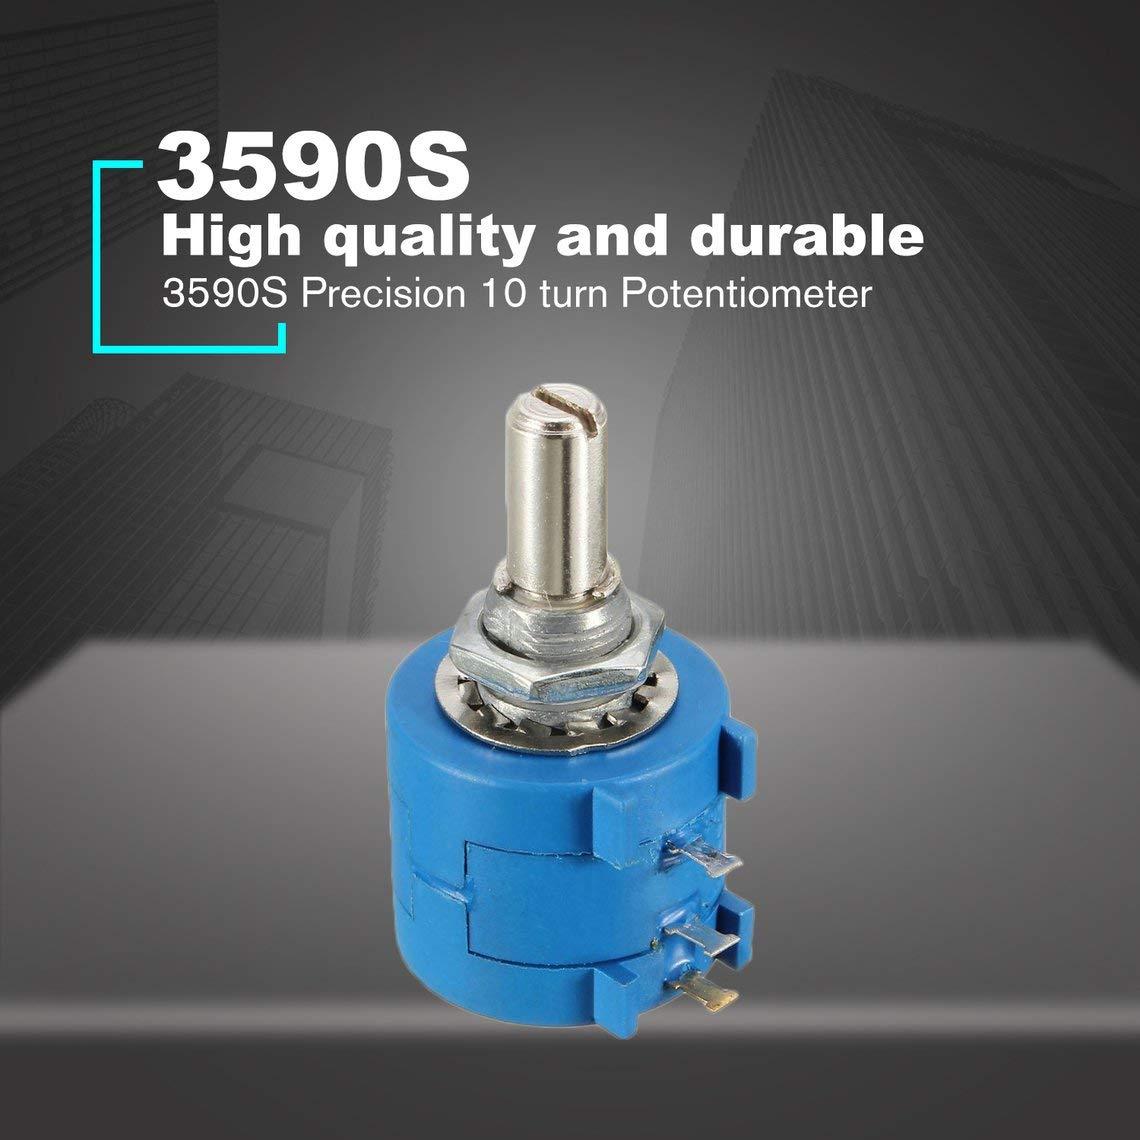 Resistencias variables Reóstatos 3590S Precision Multiturn Potenciómetro 10 anillos resistor ajustable enrollado